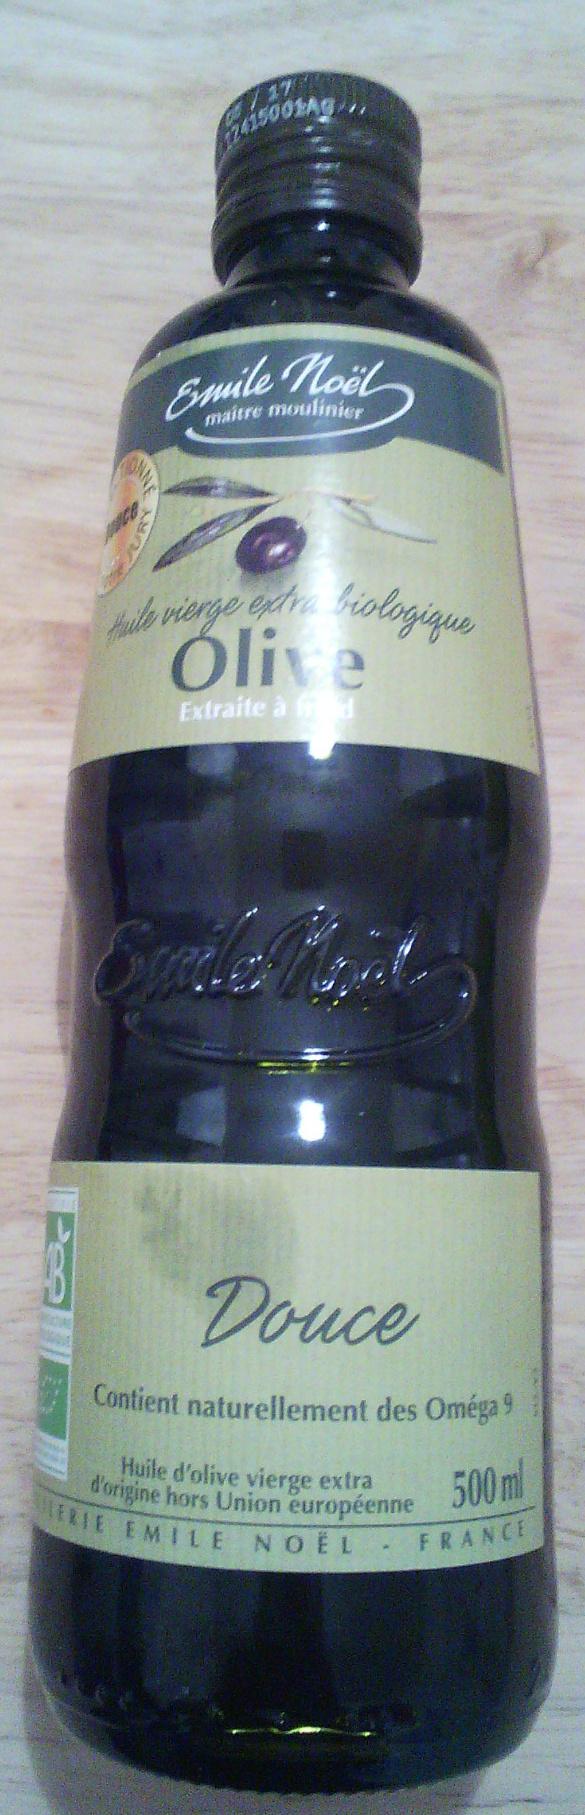 Huile d'olive vierge extra biologique - Produit - fr